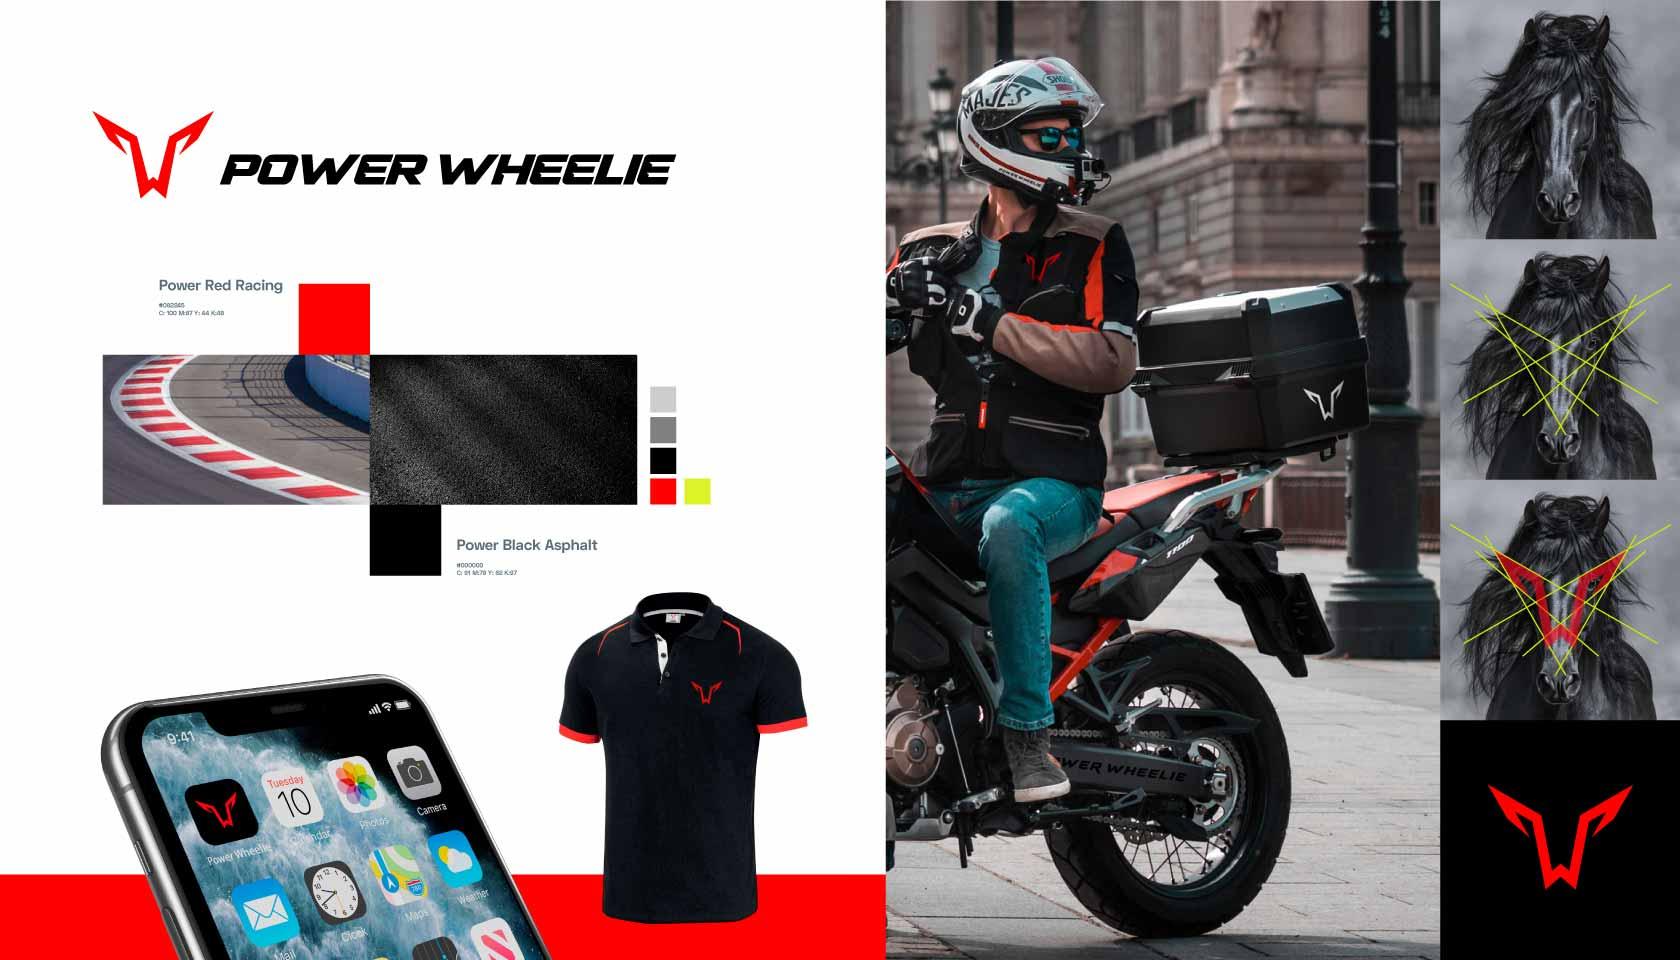 Power Wheelie branding